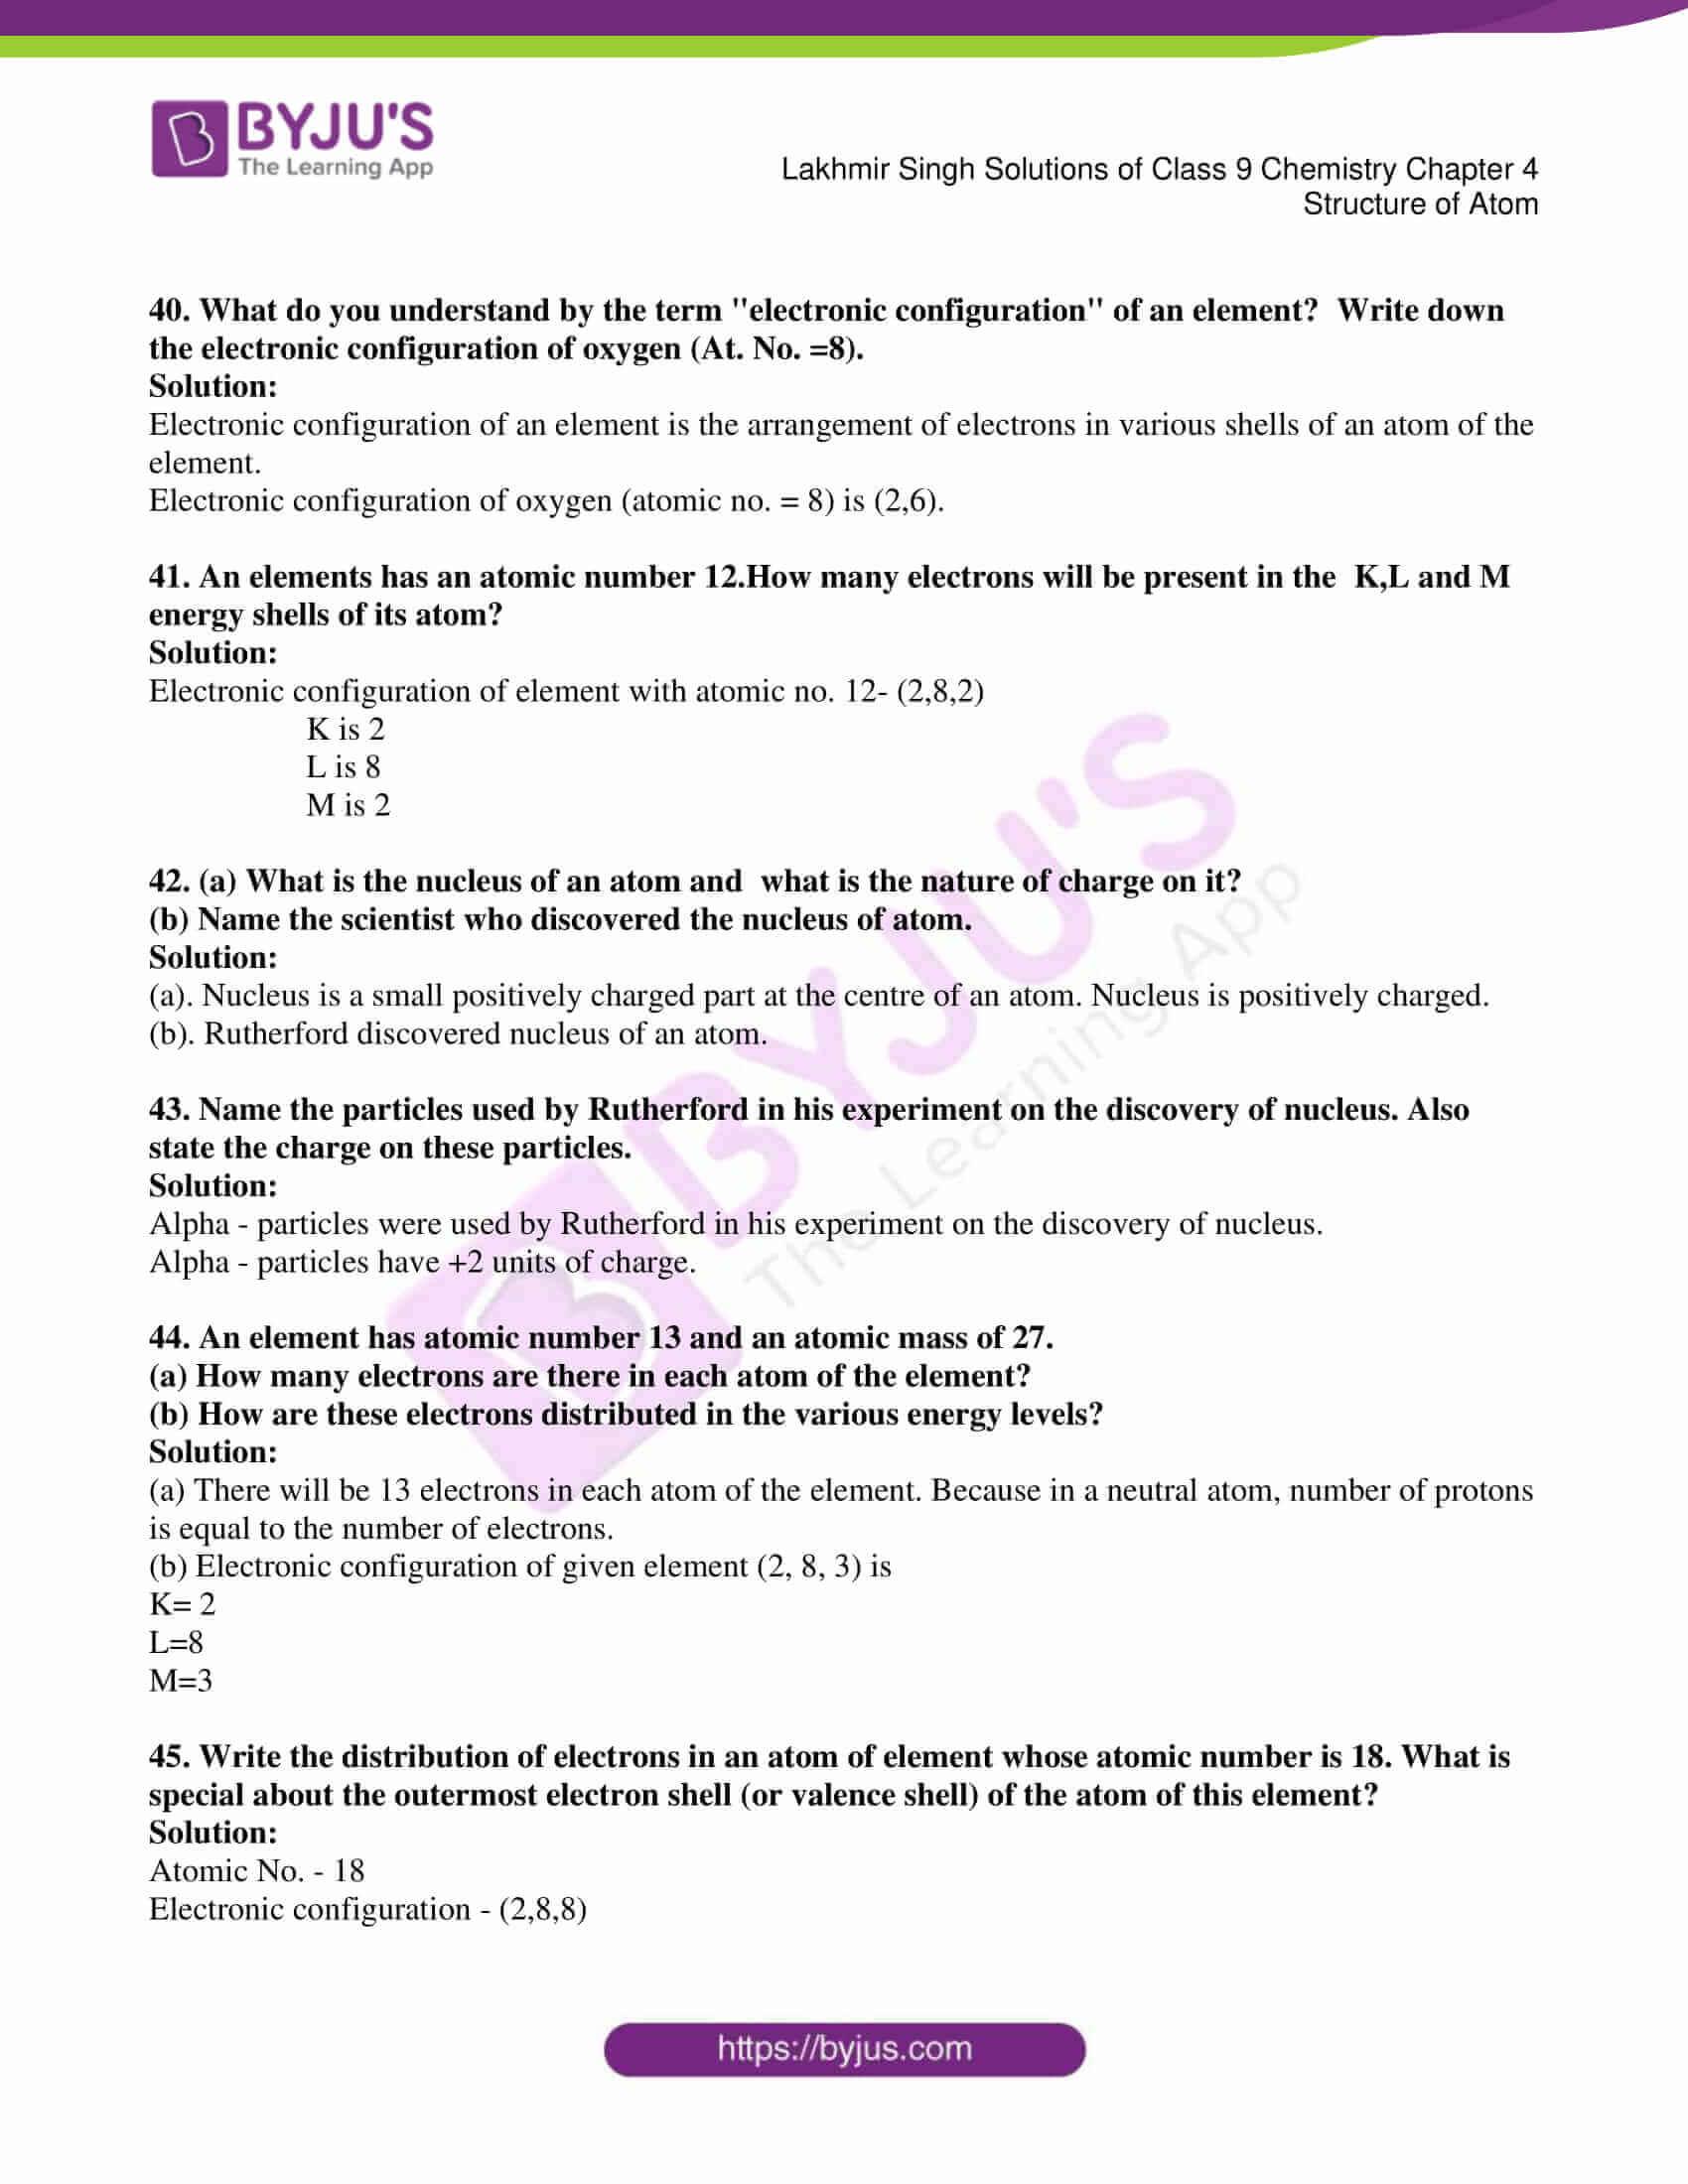 lakhmir singh solutions class 9 chemistry chapter 4 07